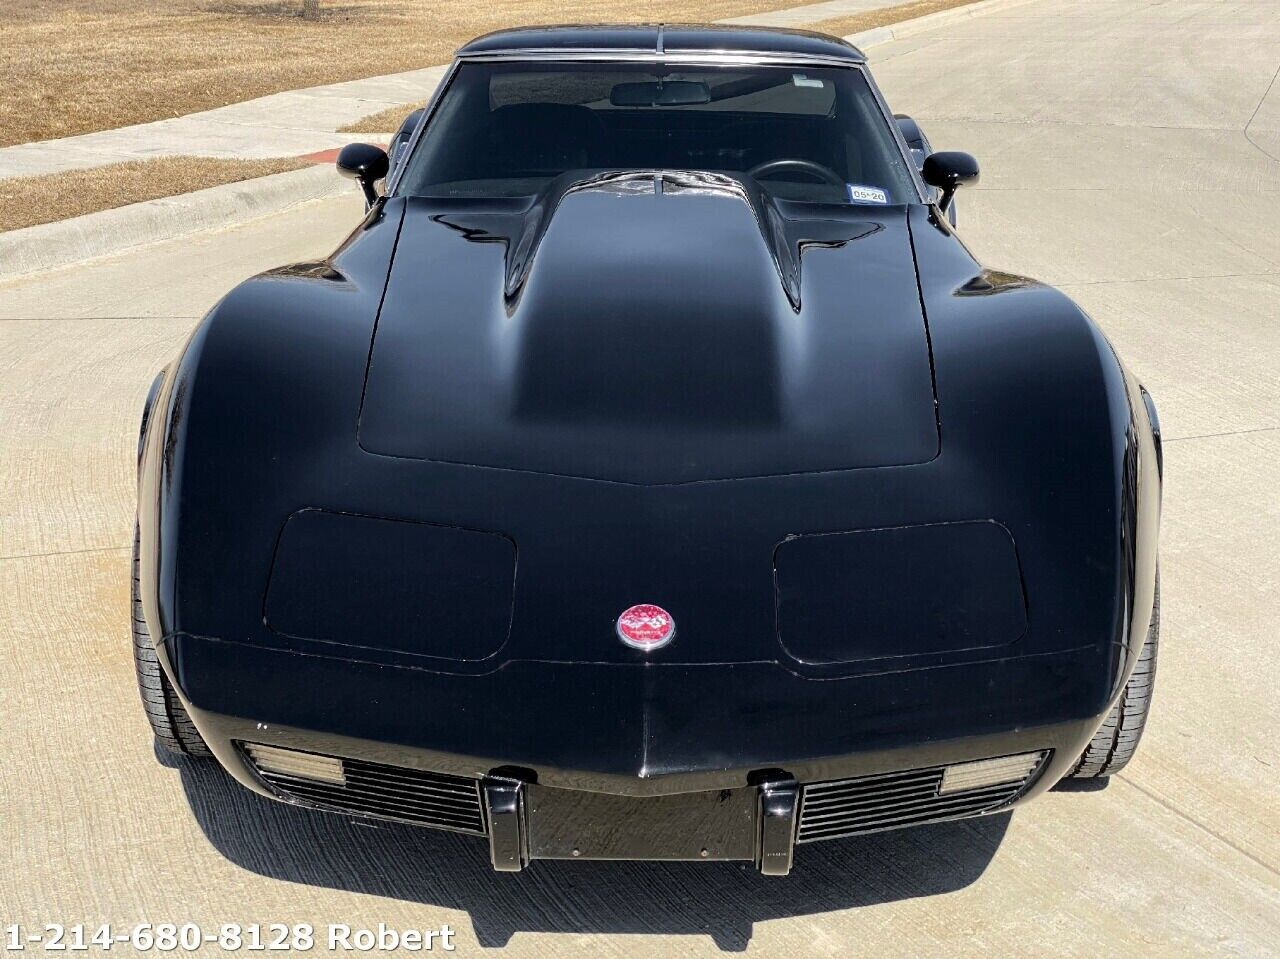 1976 Black Chevrolet Corvette Stingray  | C3 Corvette Photo 6